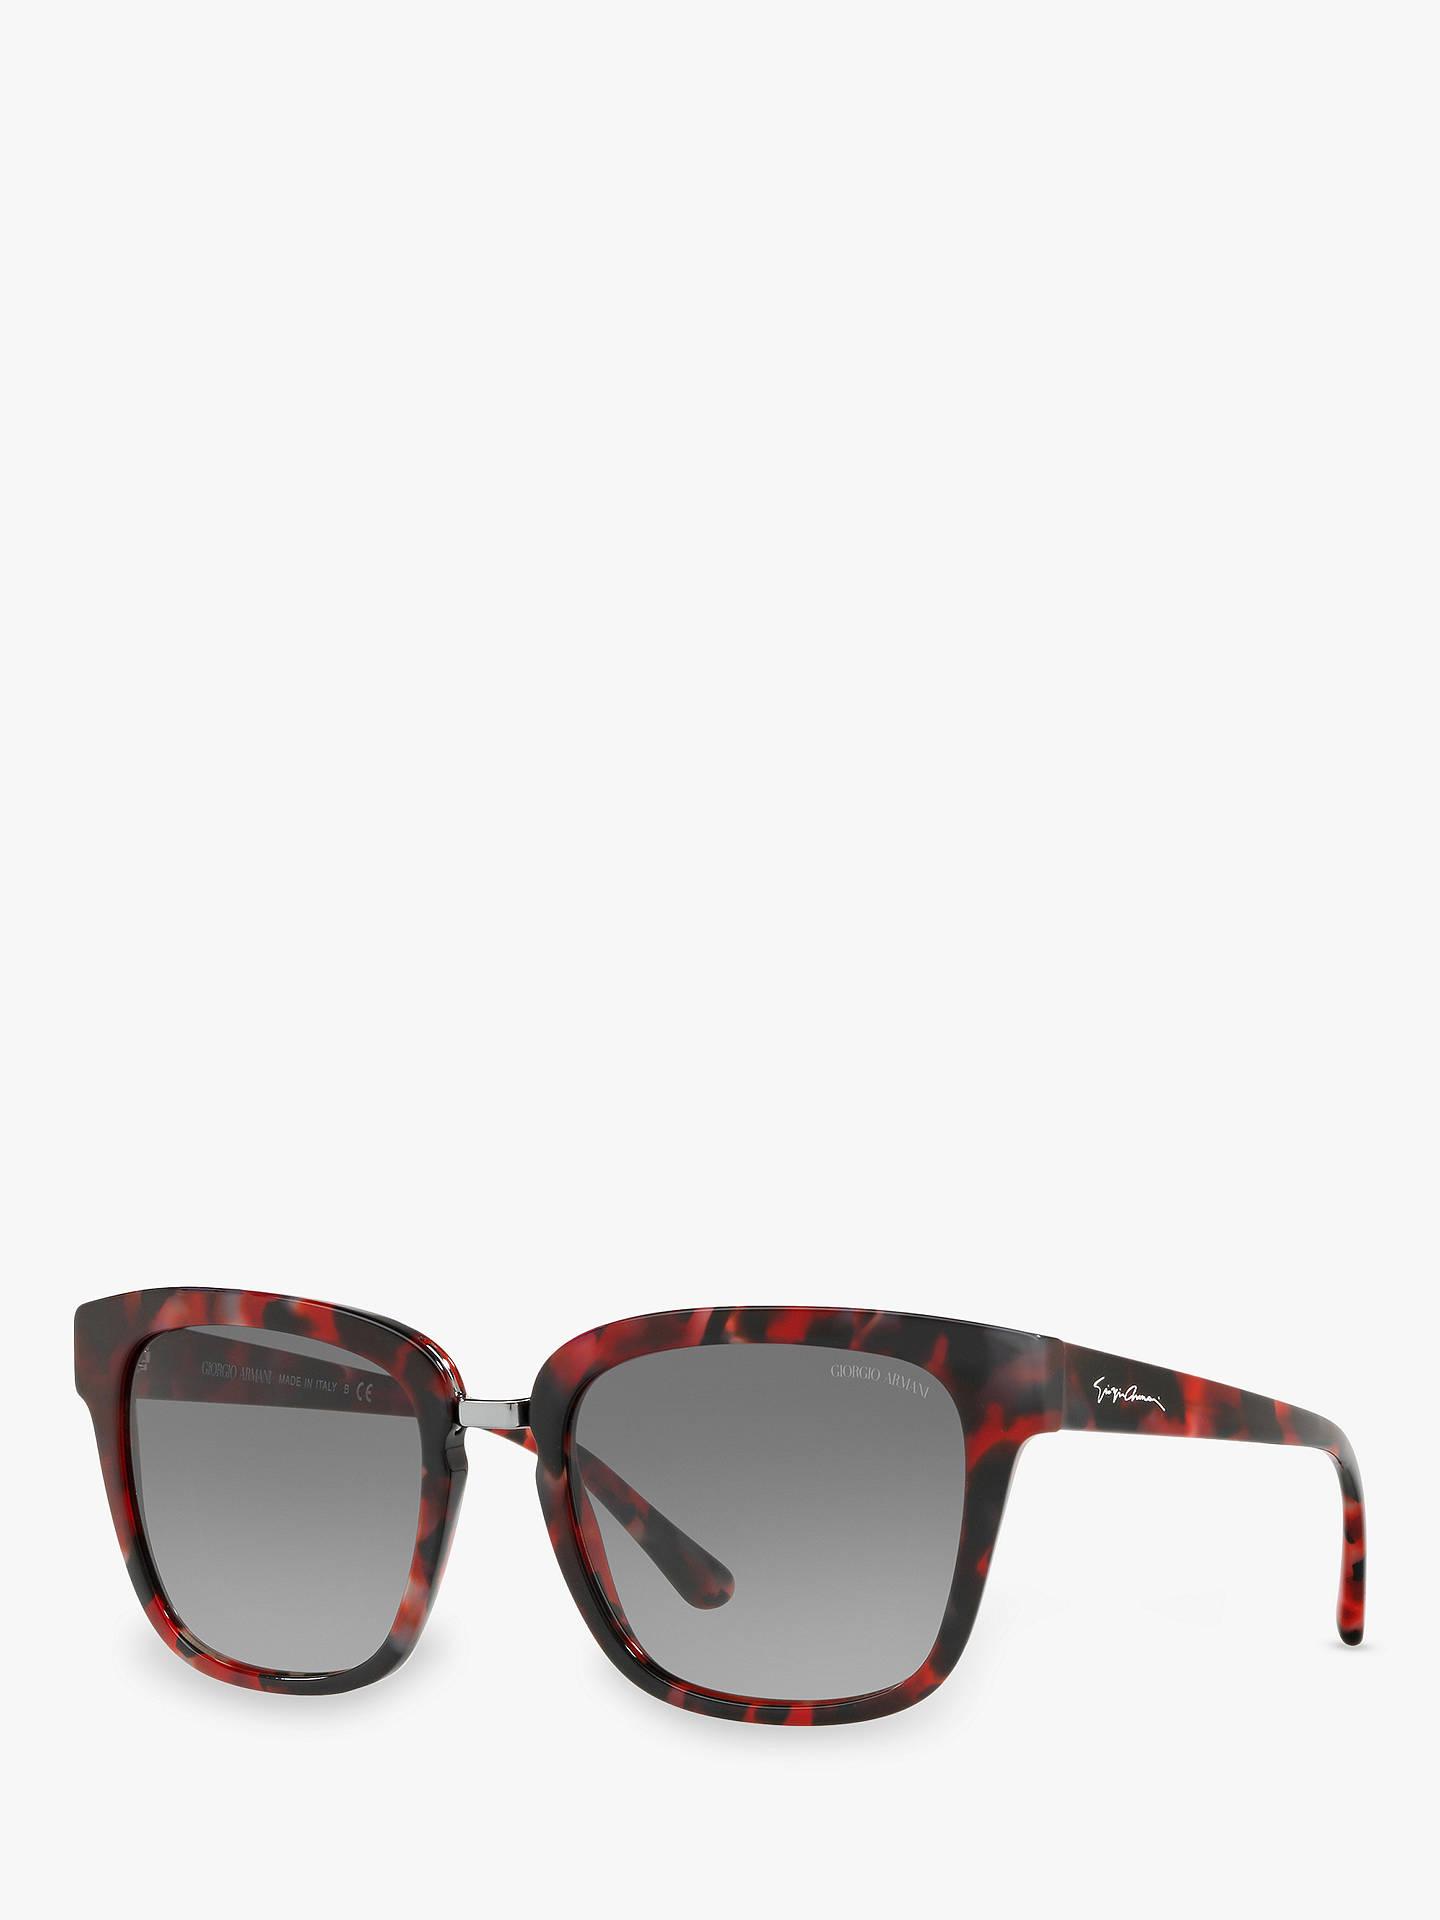 6c375bcc0ee Buy Giorgio Armani AR8106 Women s Square Sunglasses